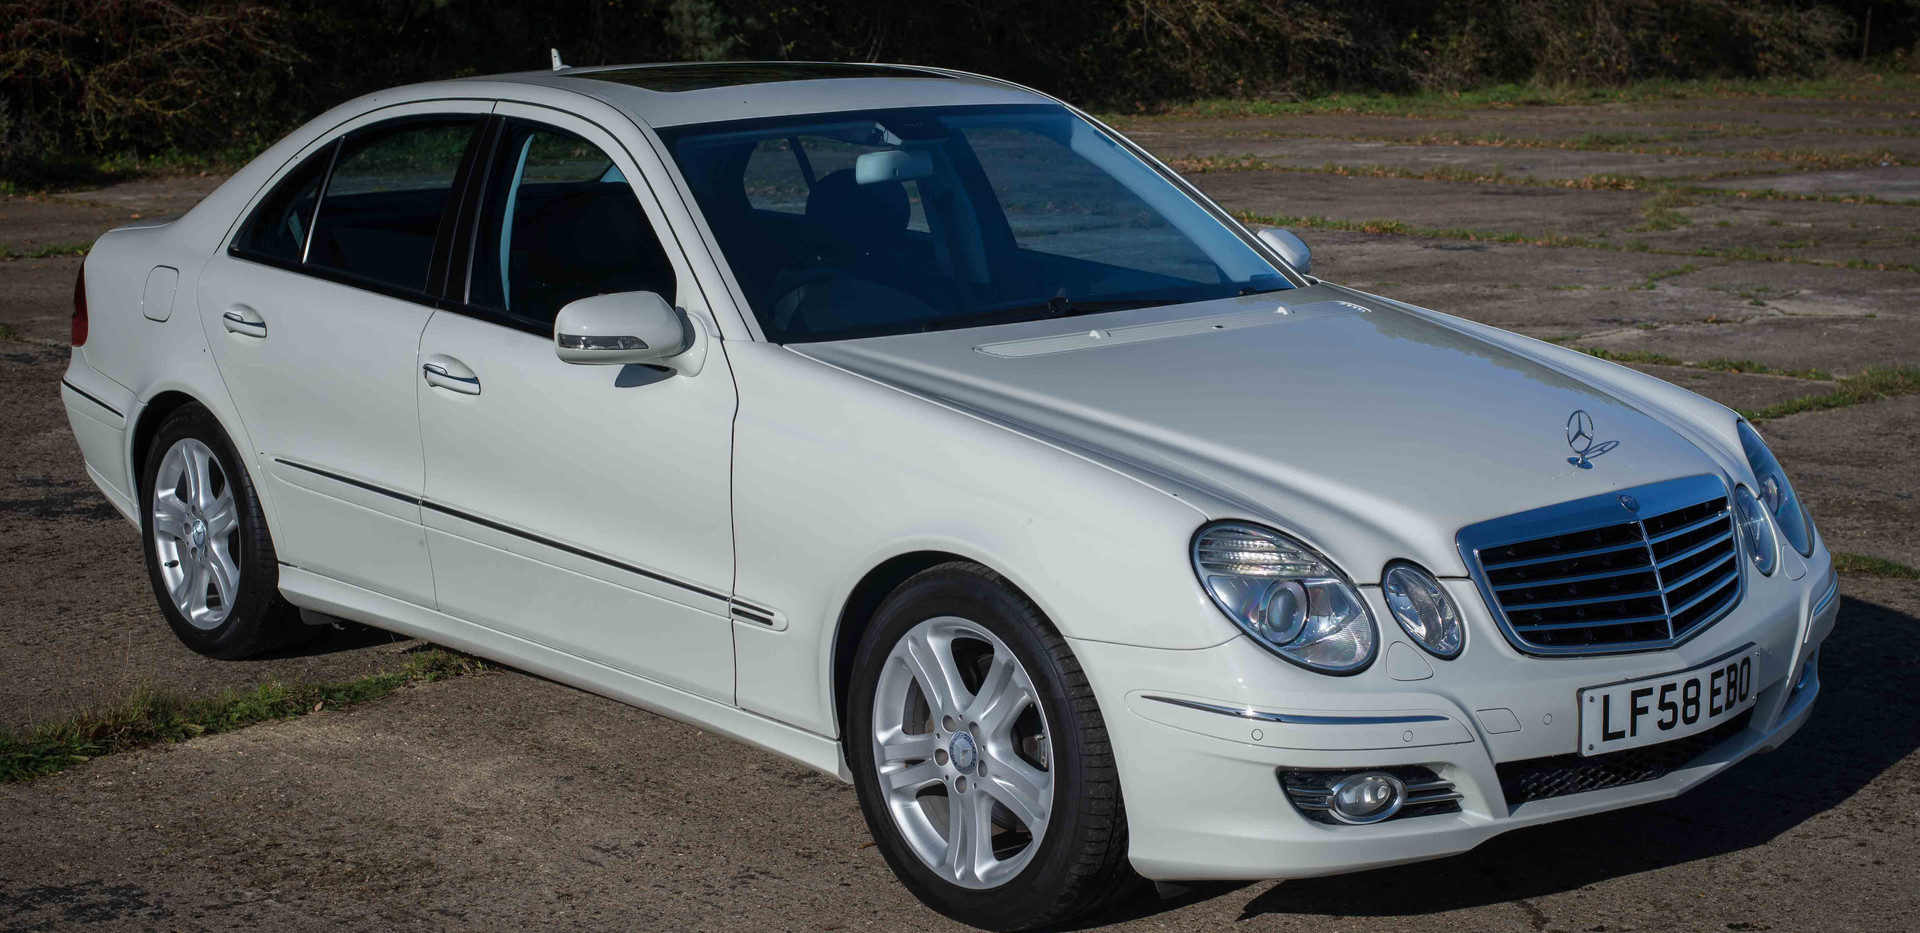 Mercedes E350 For Sale UK London  (31 of